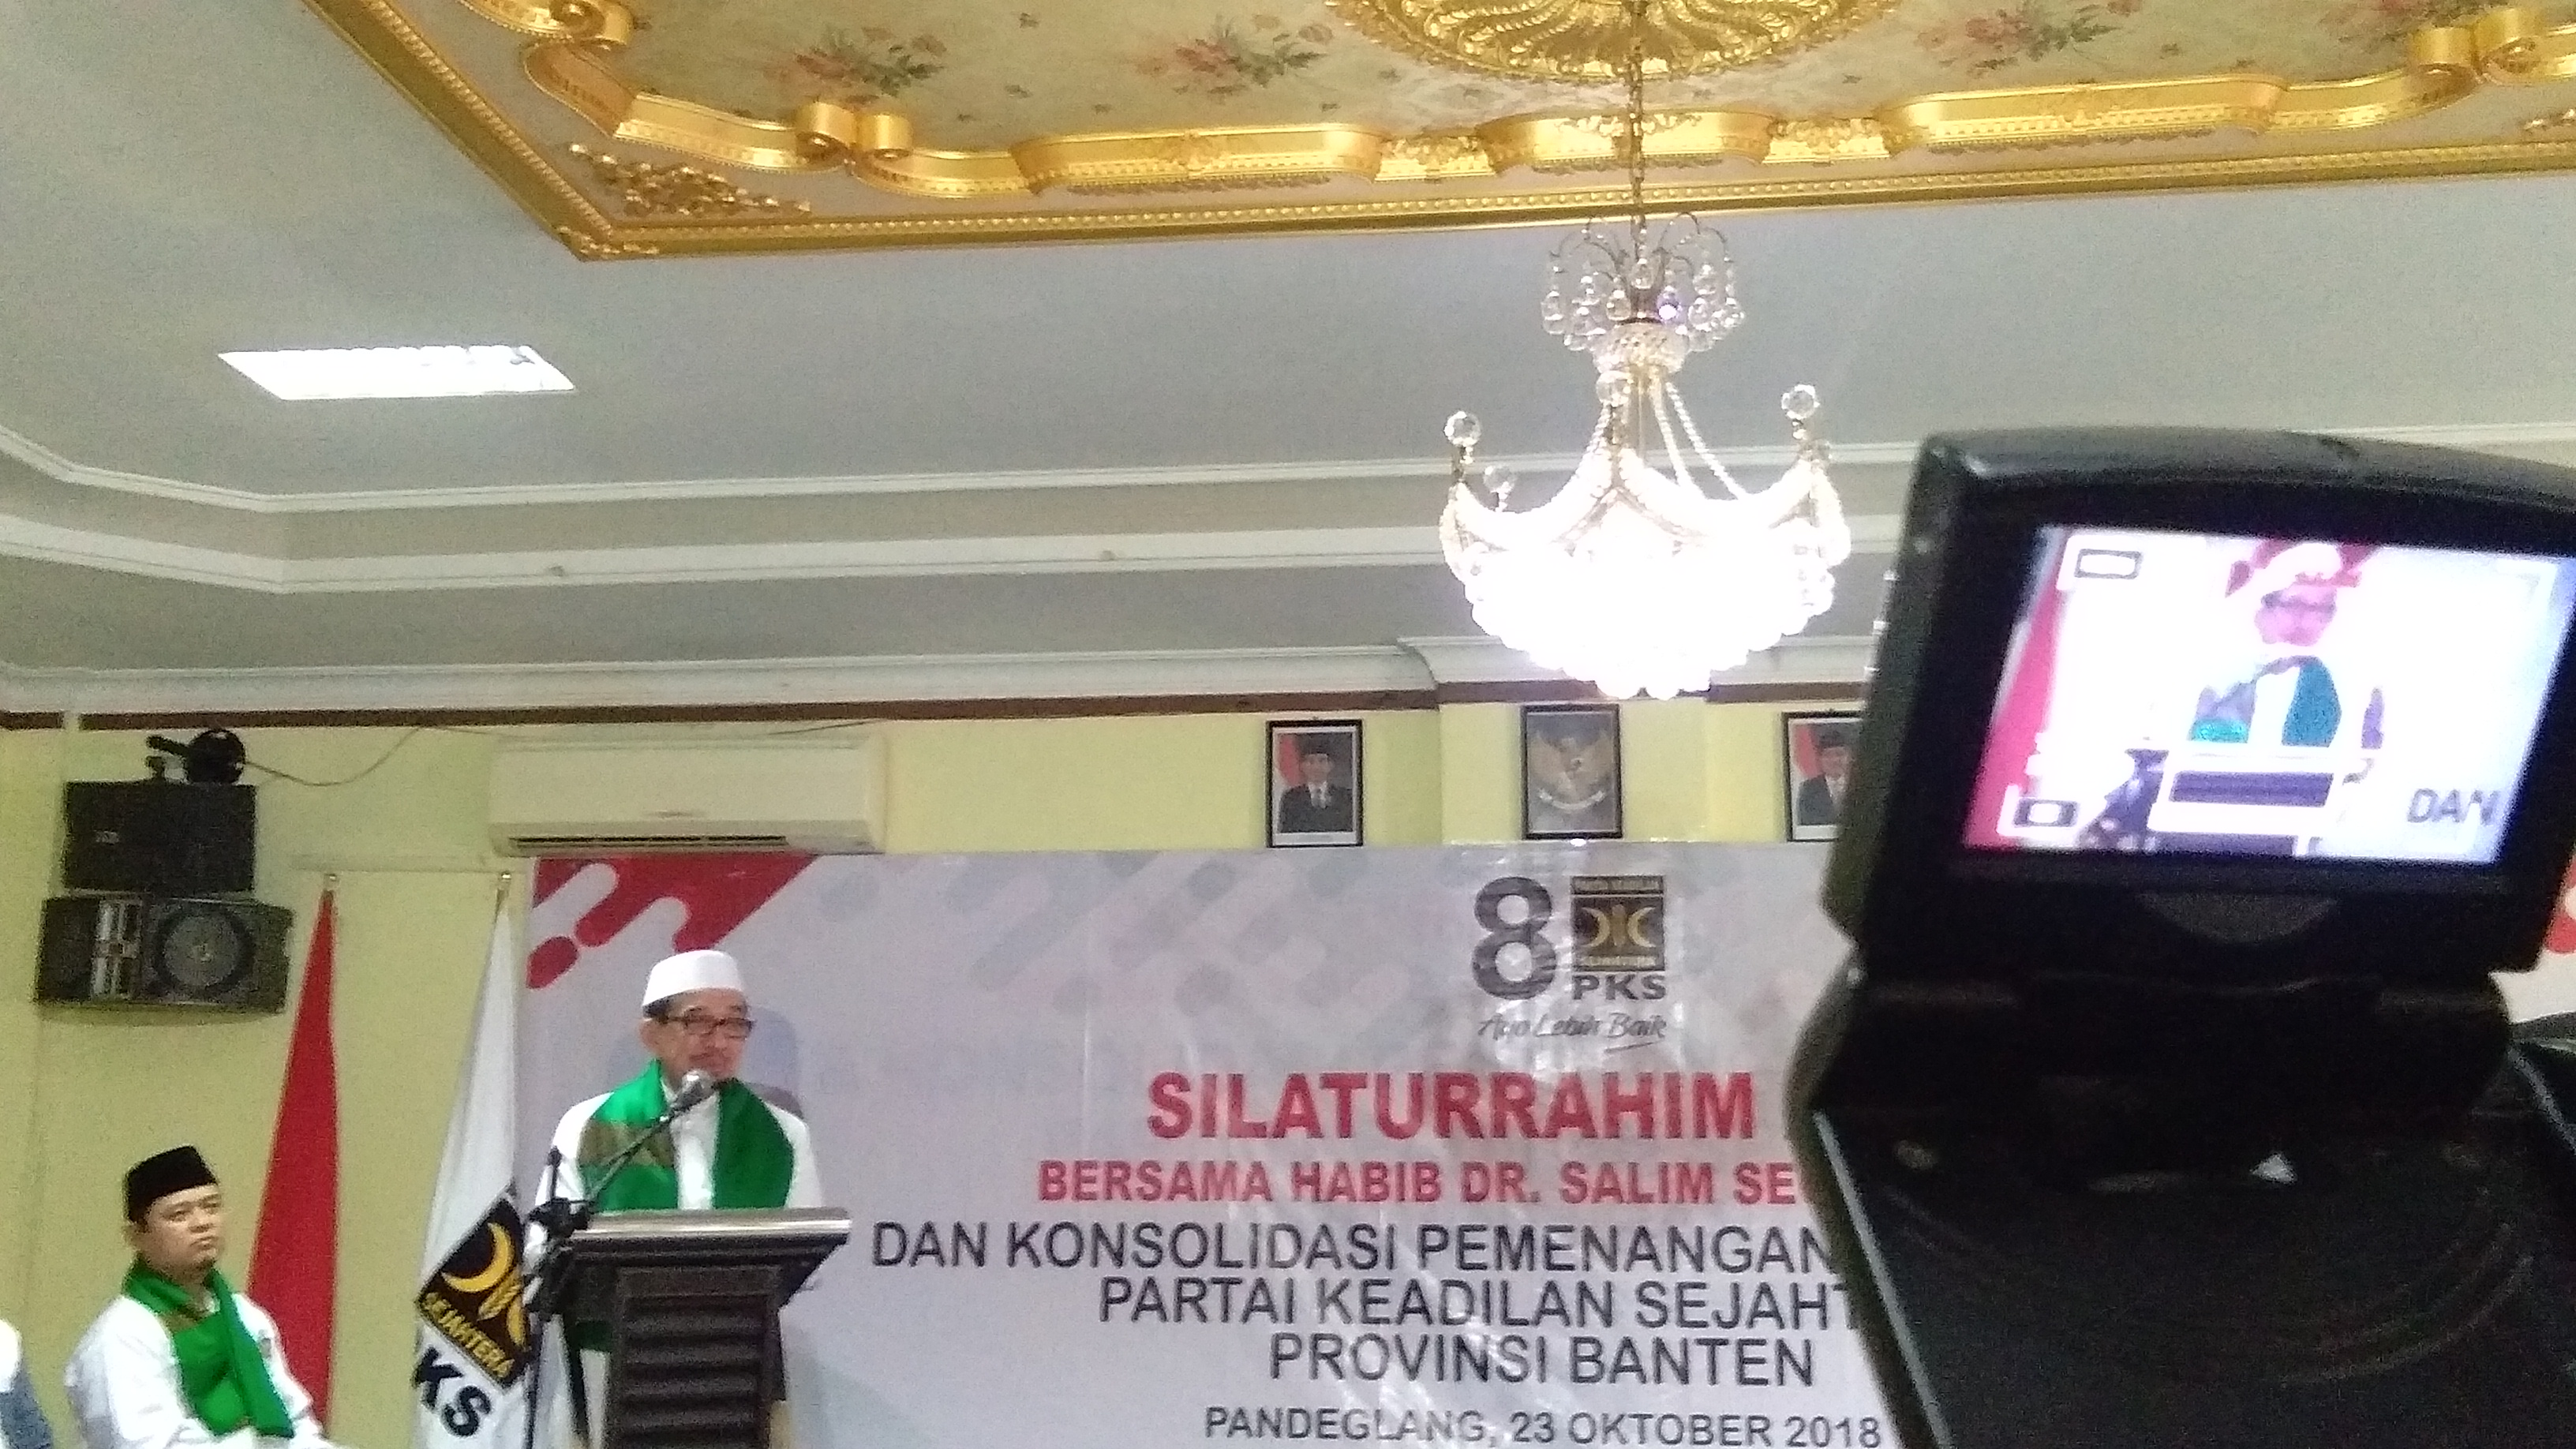 Ketua Majelis Syuro PKS Habib Salim Segaf Al-Jufri